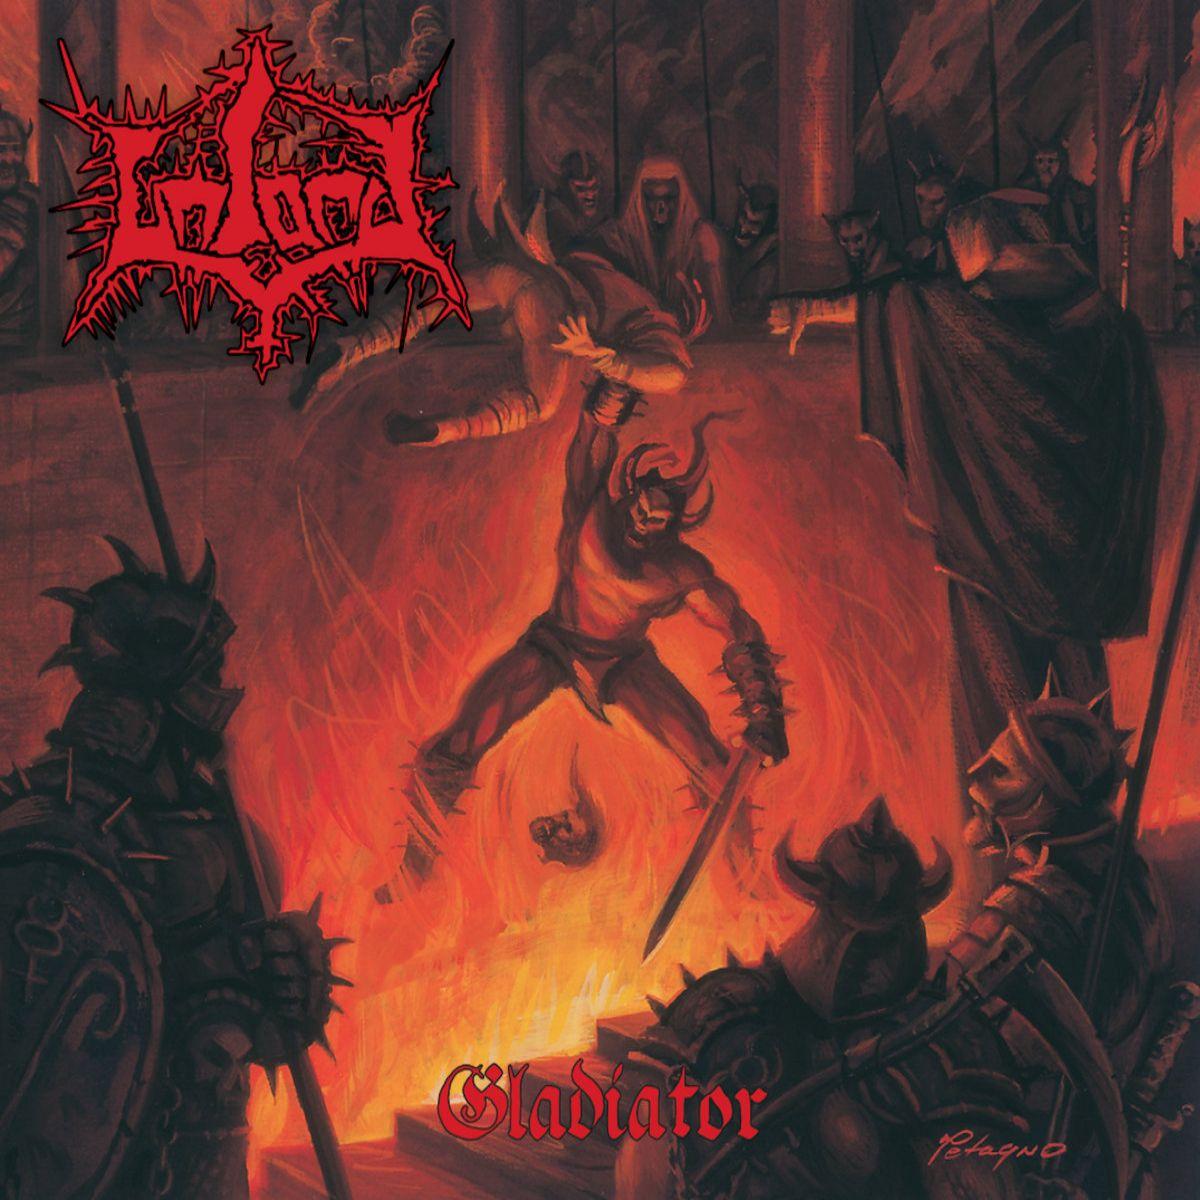 Unlord - Gladiator